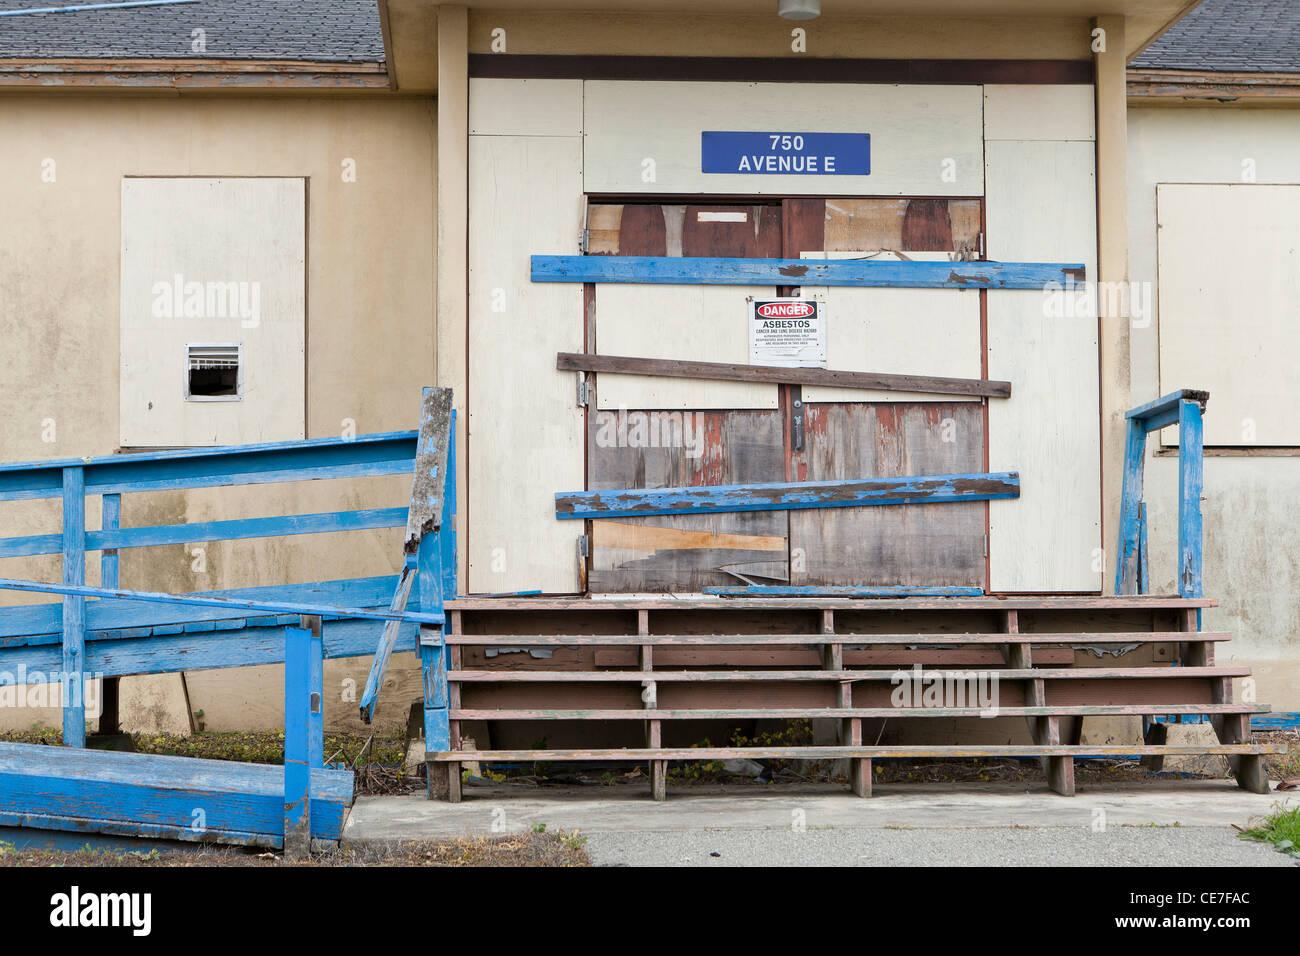 Condemned building due to asbestos contamination - Stock Image